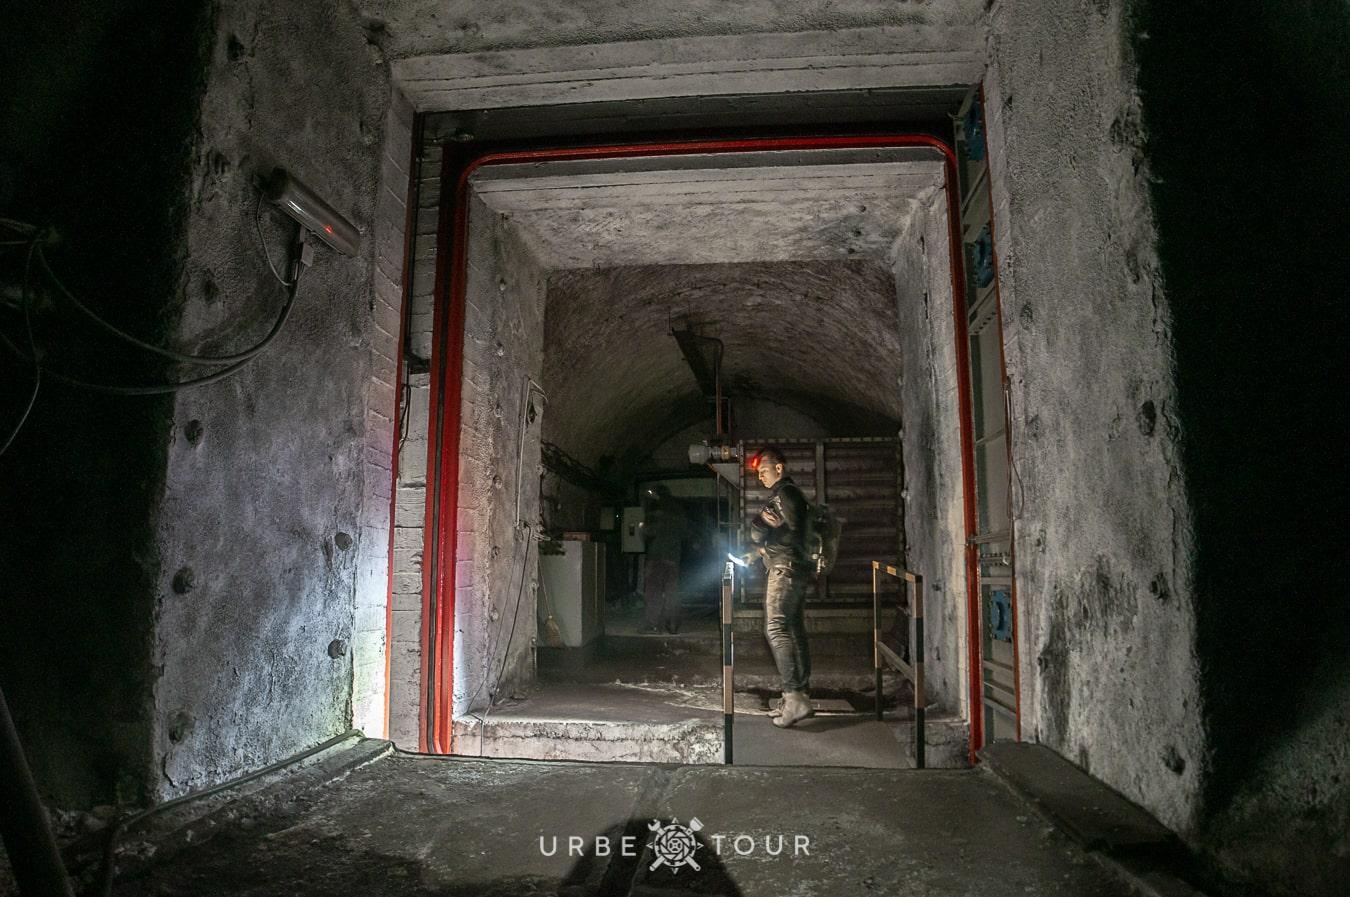 F-4-Rakosi-Bunker-budapest-23 Спецобъект Ф-4 - бункер коммуниста Ракоси в центре Будапешта